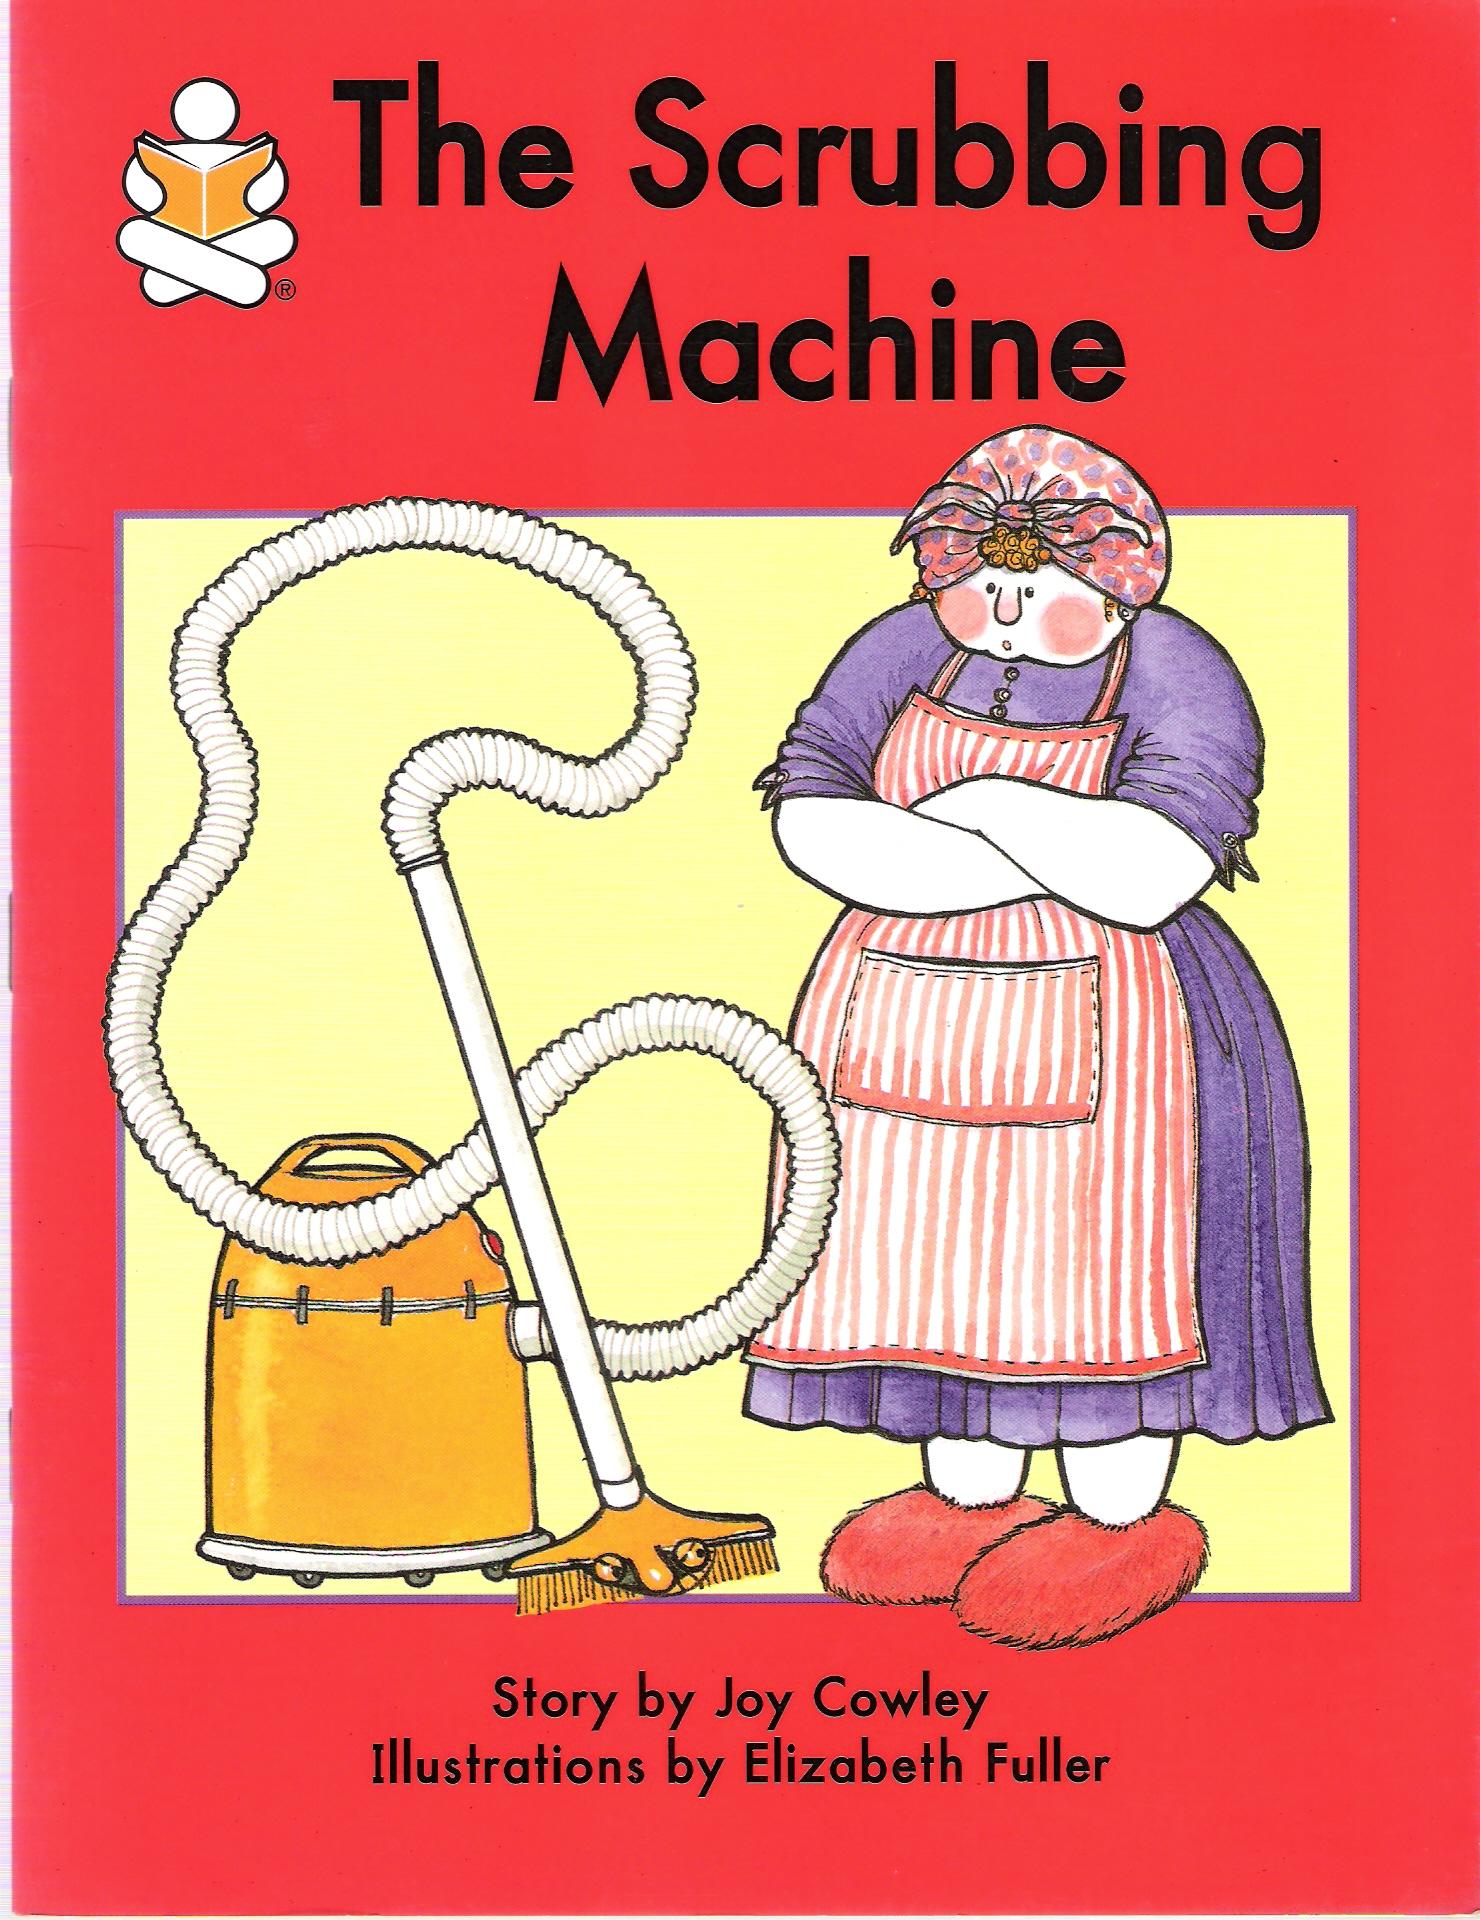 The scrubbing machine